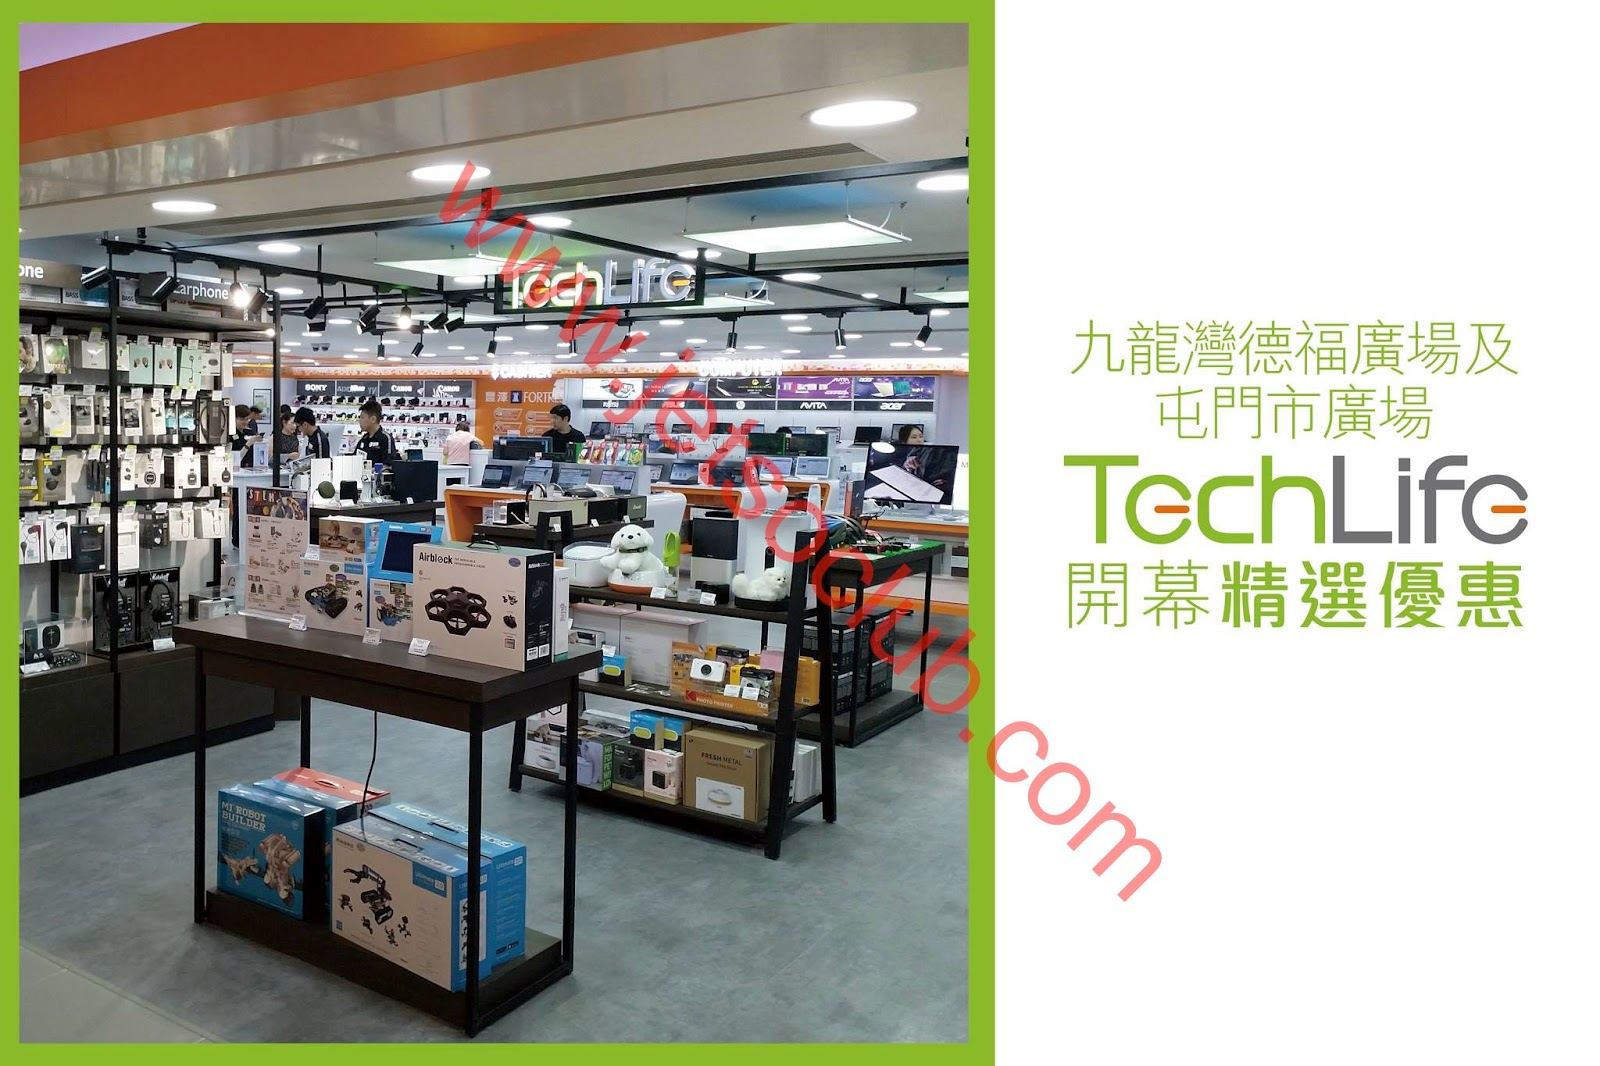 Fortress 豐澤:德福廣場/屯門市廣場店 TechLife開幕精選優惠(至17/8) ( Jetso Club 著數俱樂部 )